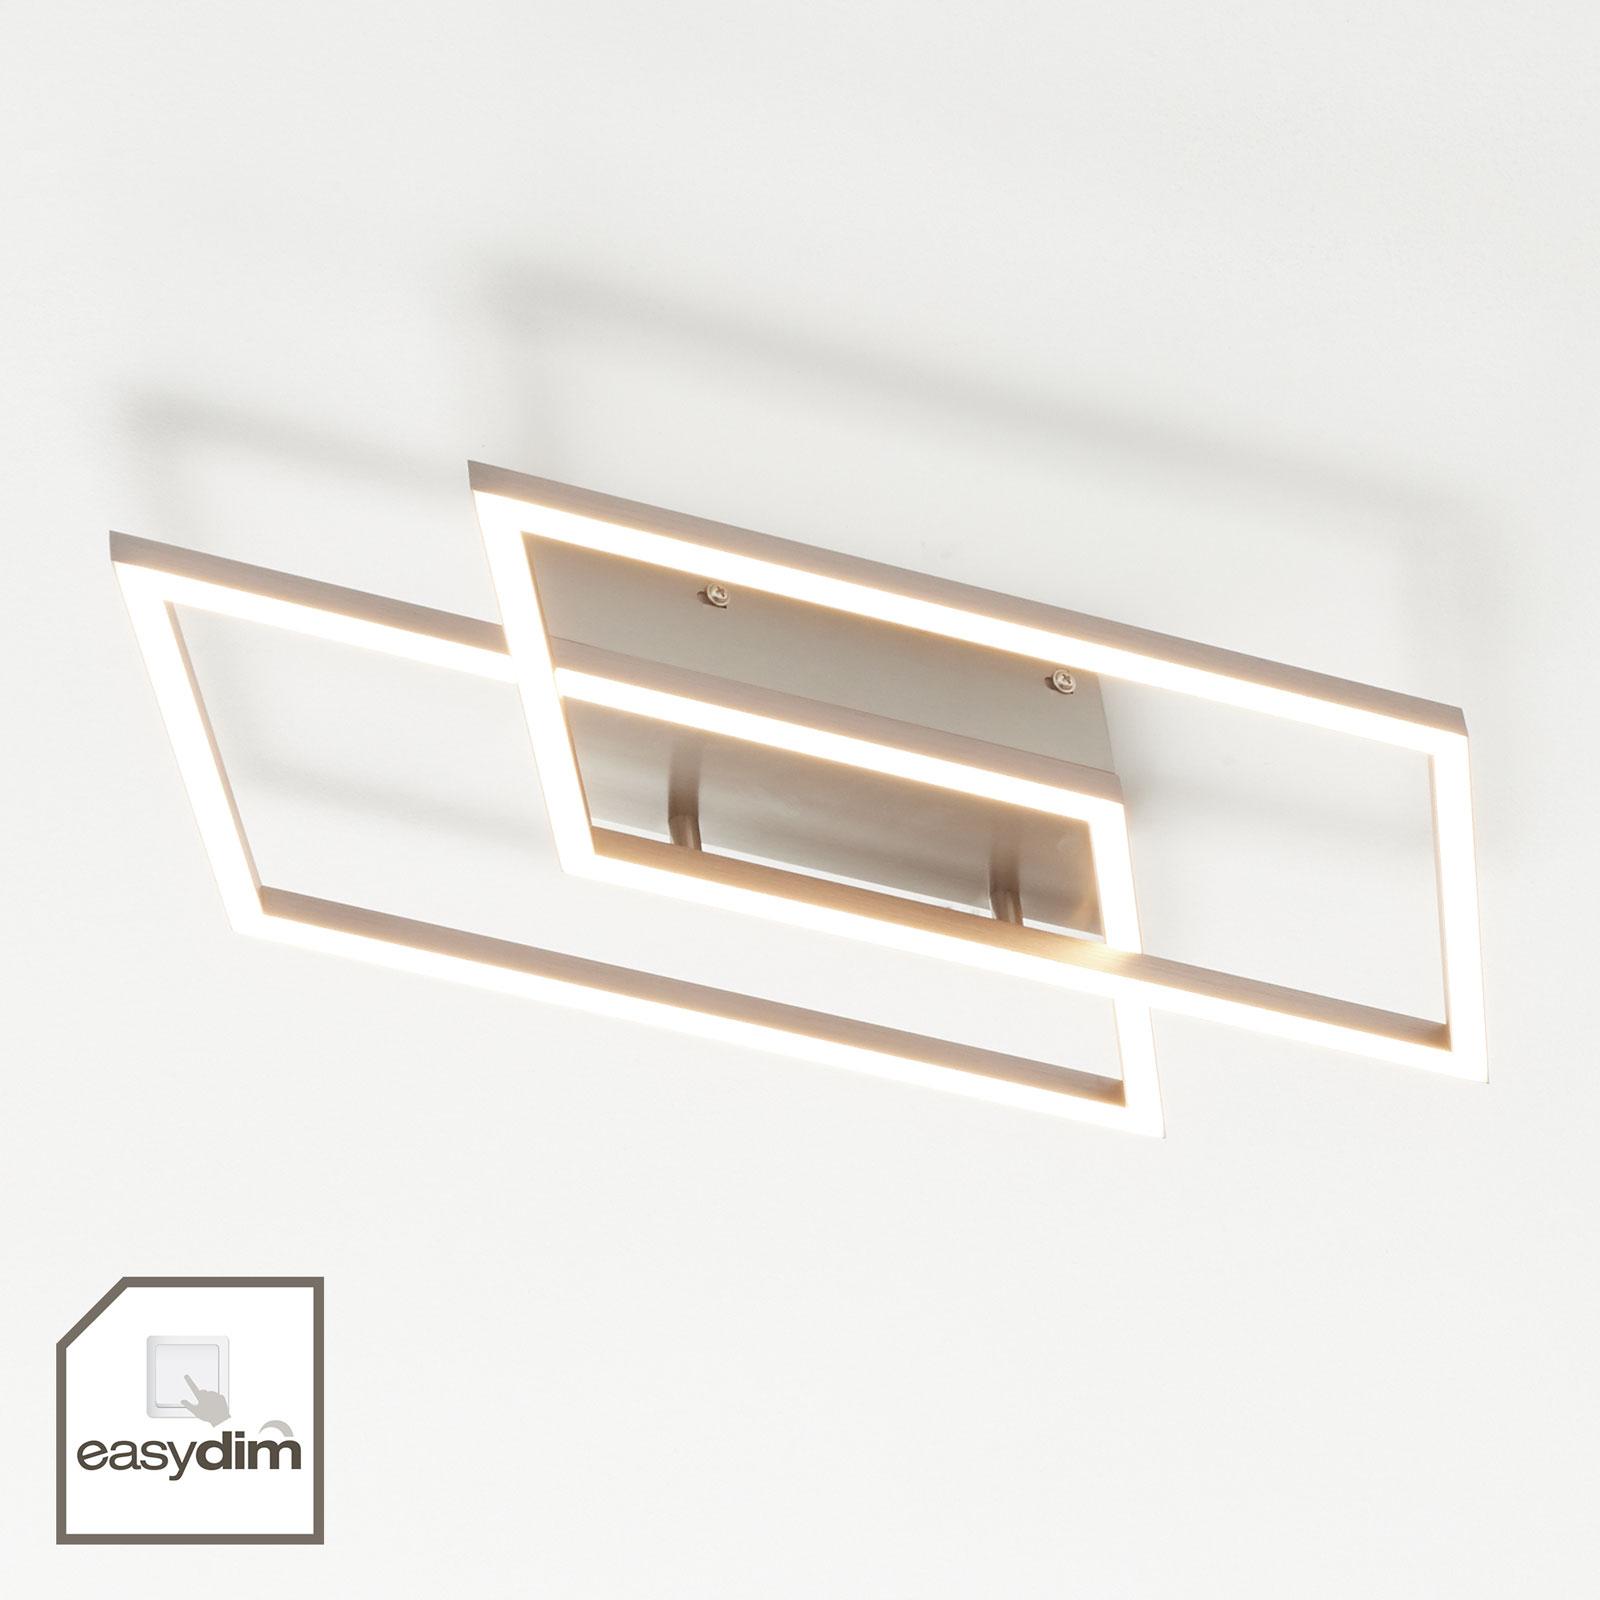 LED plafondlamp Inigo met 2 lampjes lengte 53,8 cm